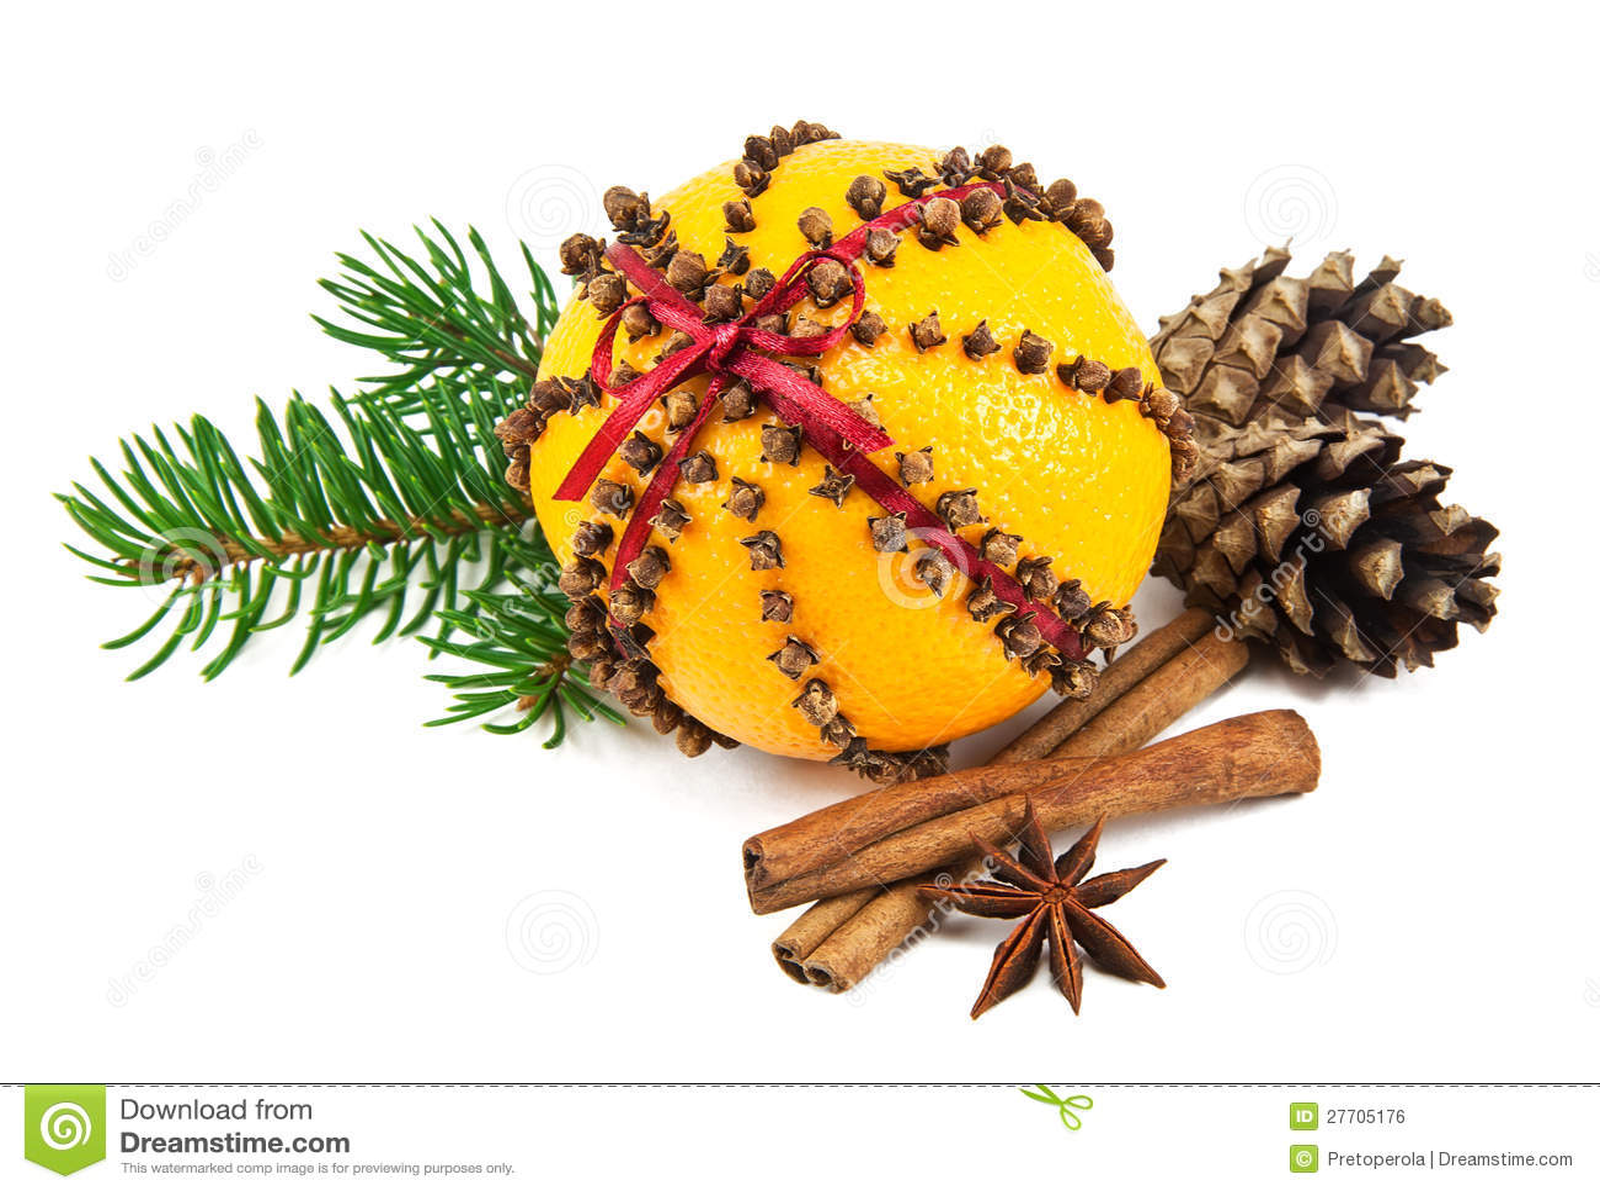 Christmas Clove And Orange Pomander Stock Photo Image